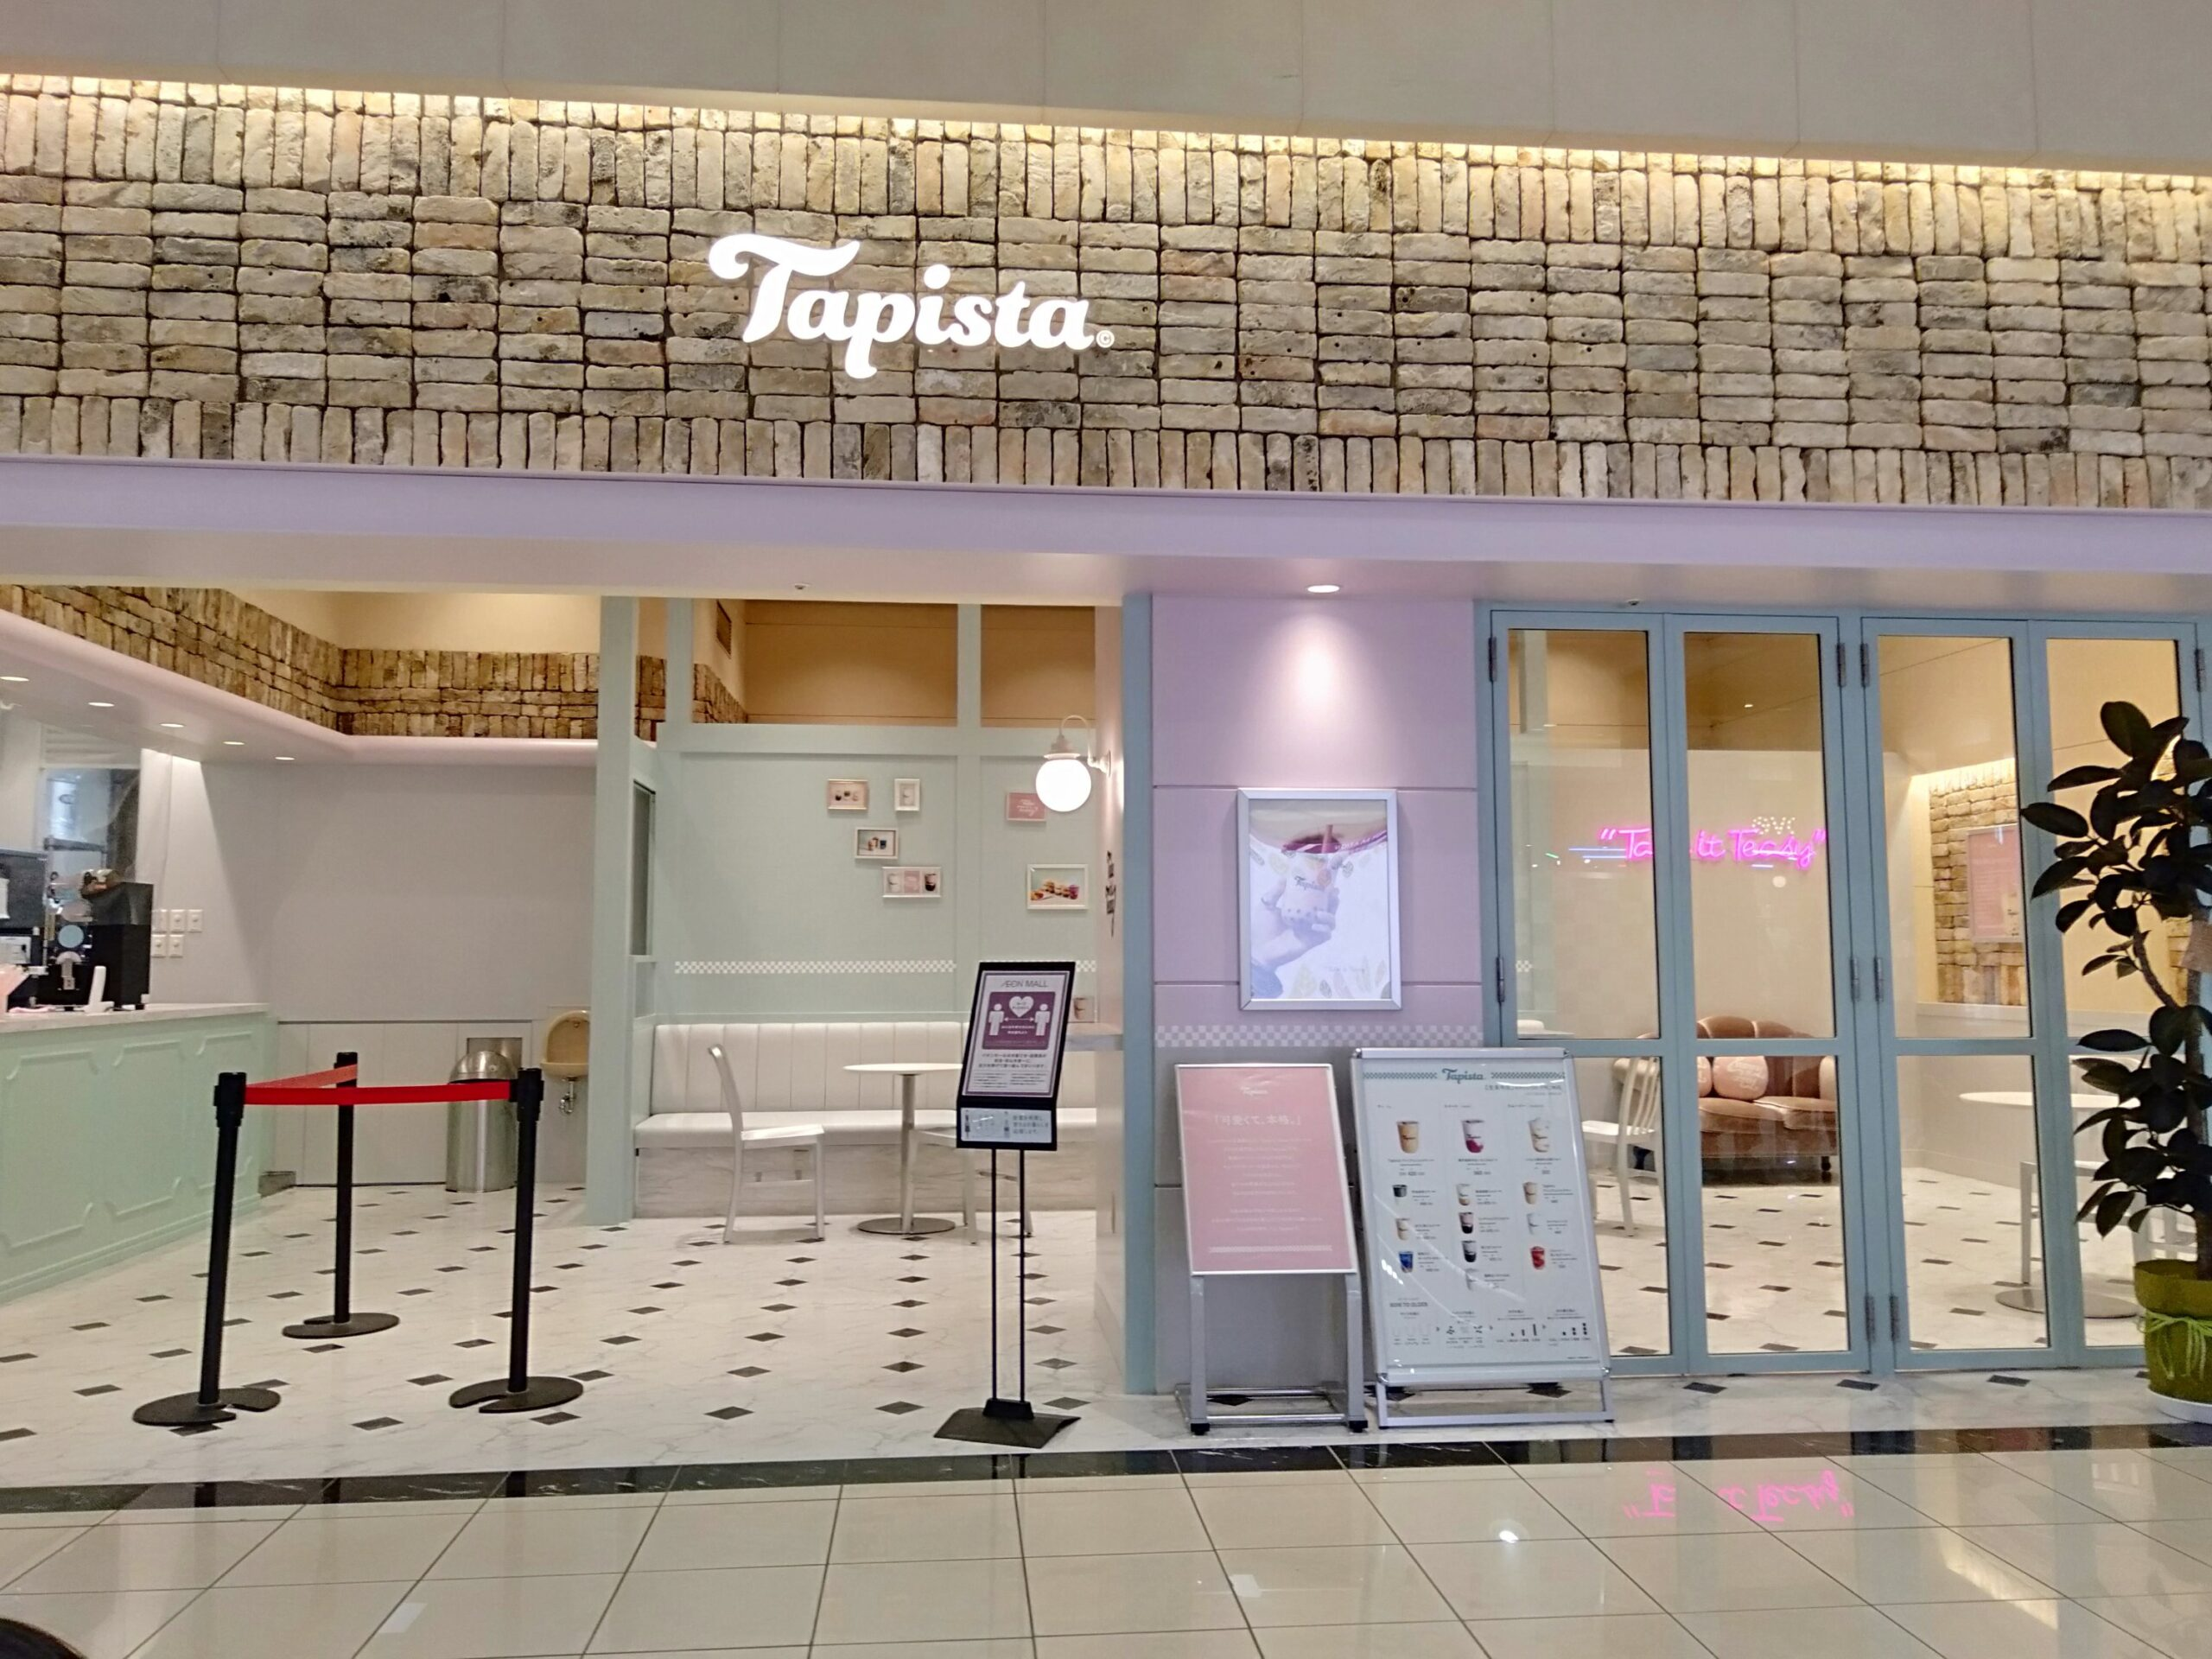 https://www.tapista.jp/タピスタ( Tapista )イオンモール高岡店でタピオカ抜きドリンクを頂く。